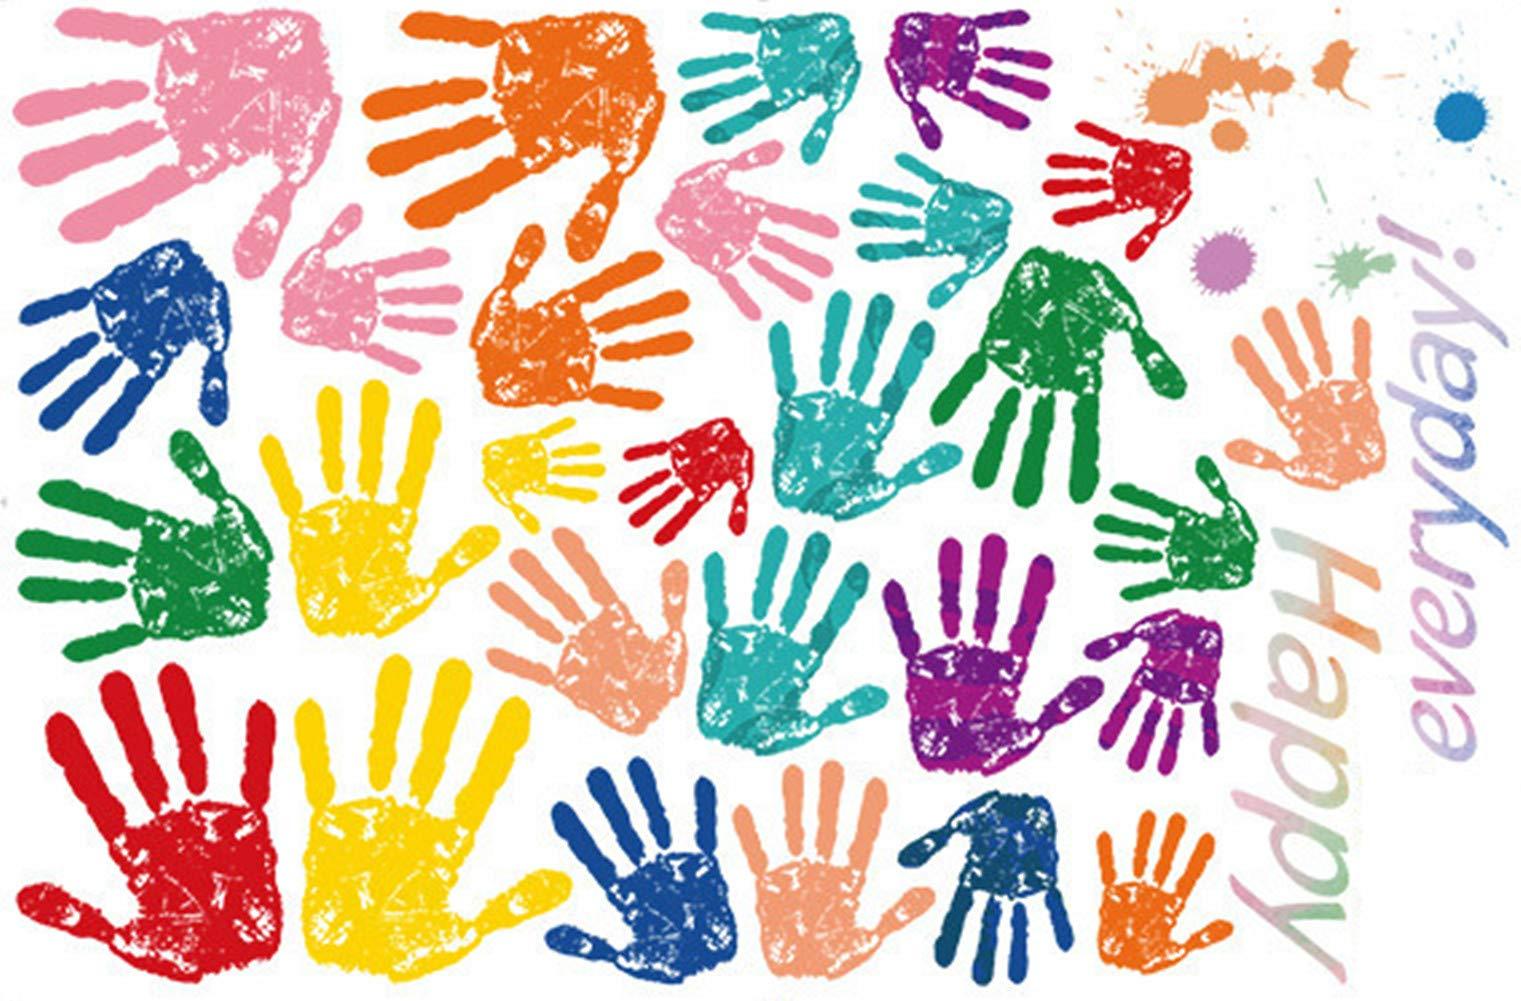 Emoyi 52 pcs DIY Handprints Primary Color Wall Sticker Art Decal Set Kids Rooms Bedroom